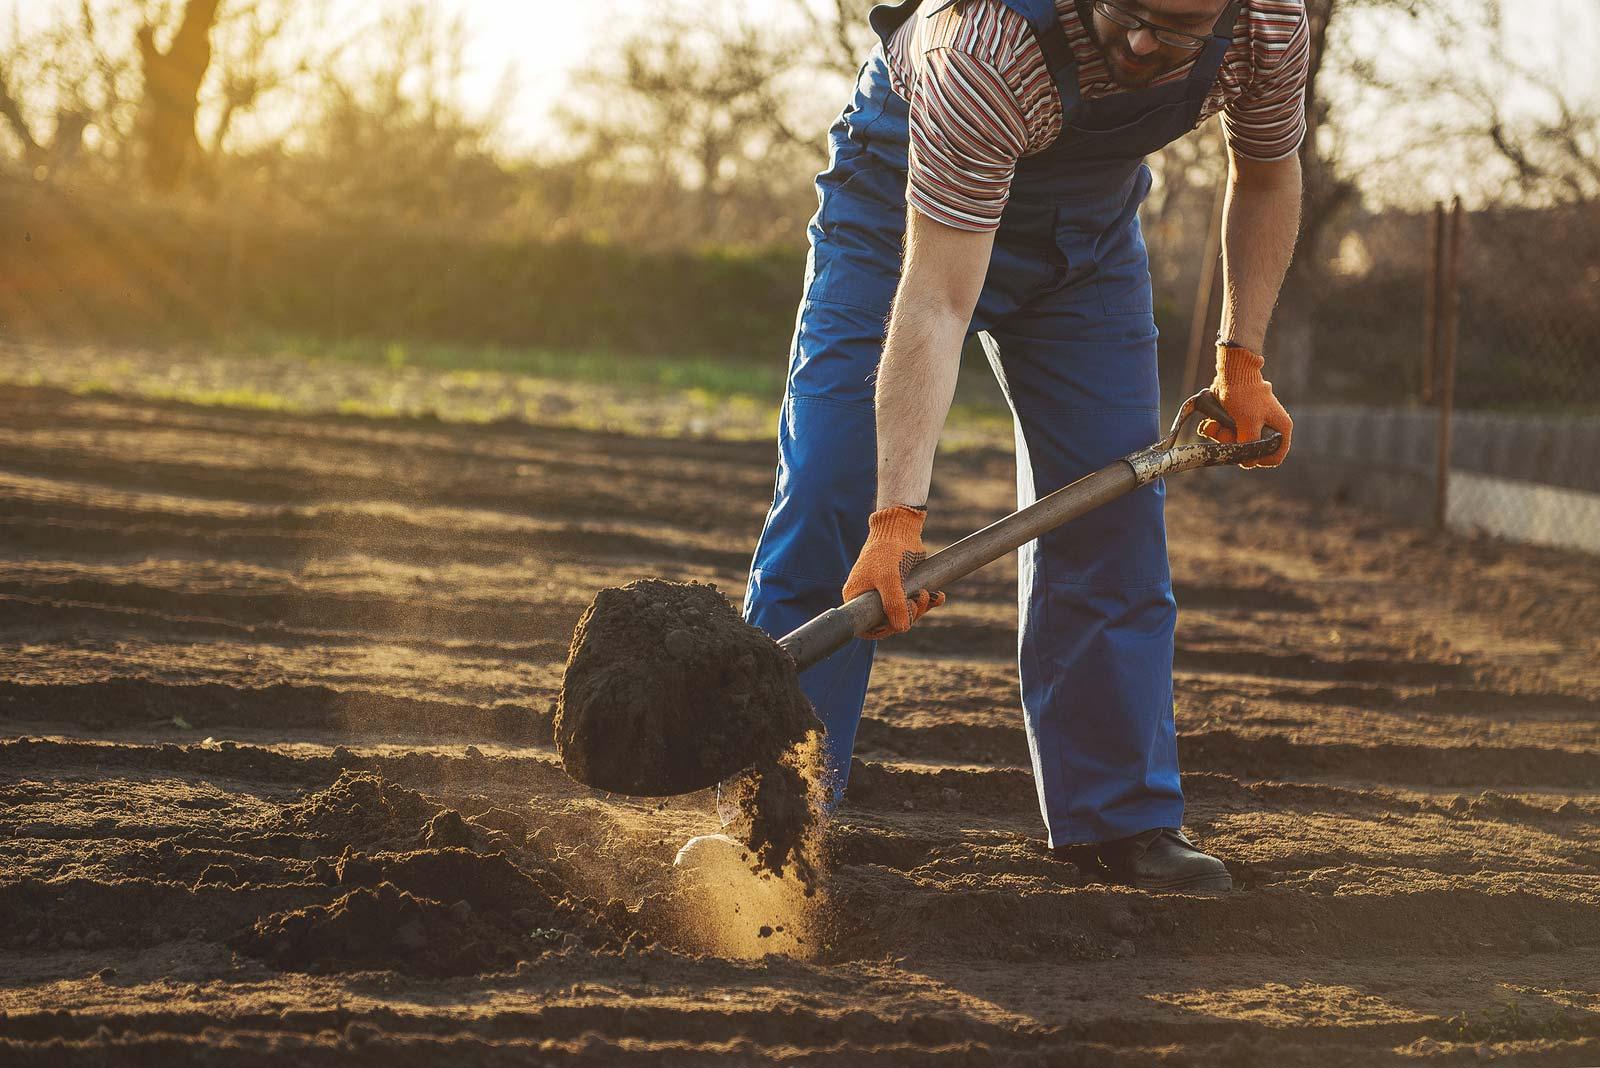 Man uses garden tools in yard